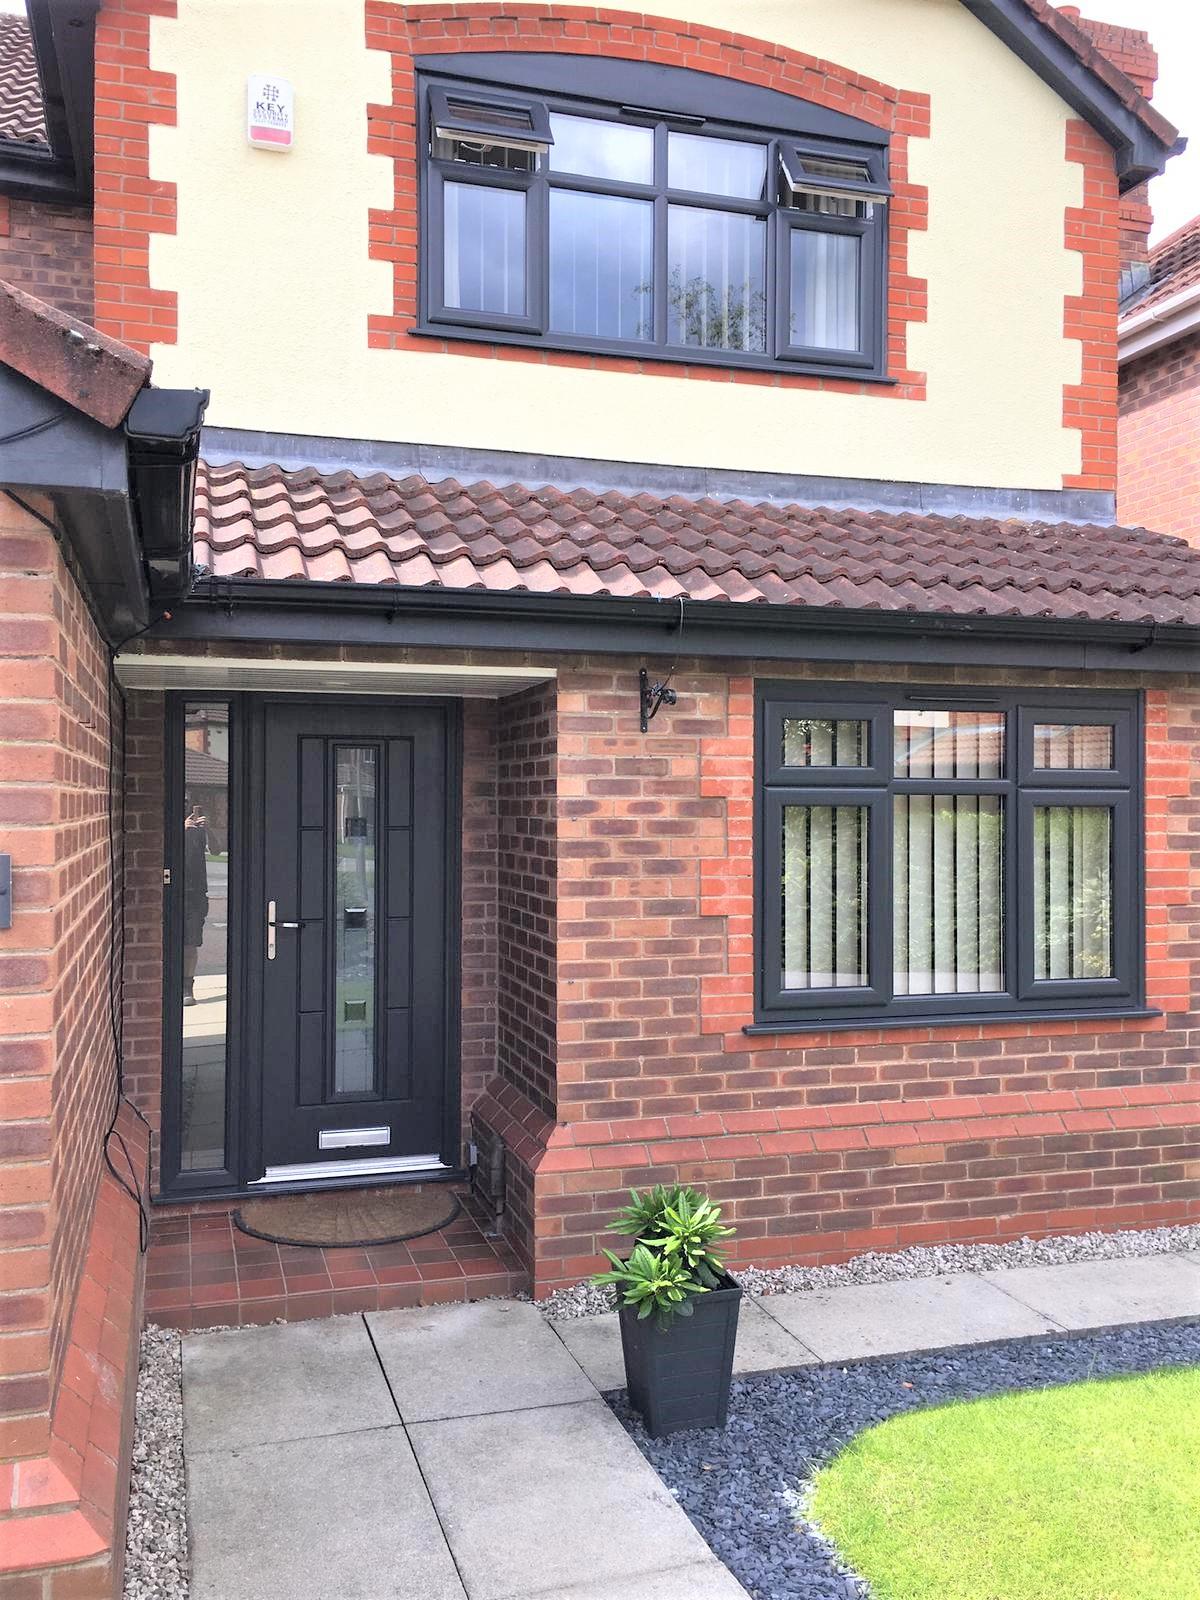 New Black Ash Double Glazed Windows & Do